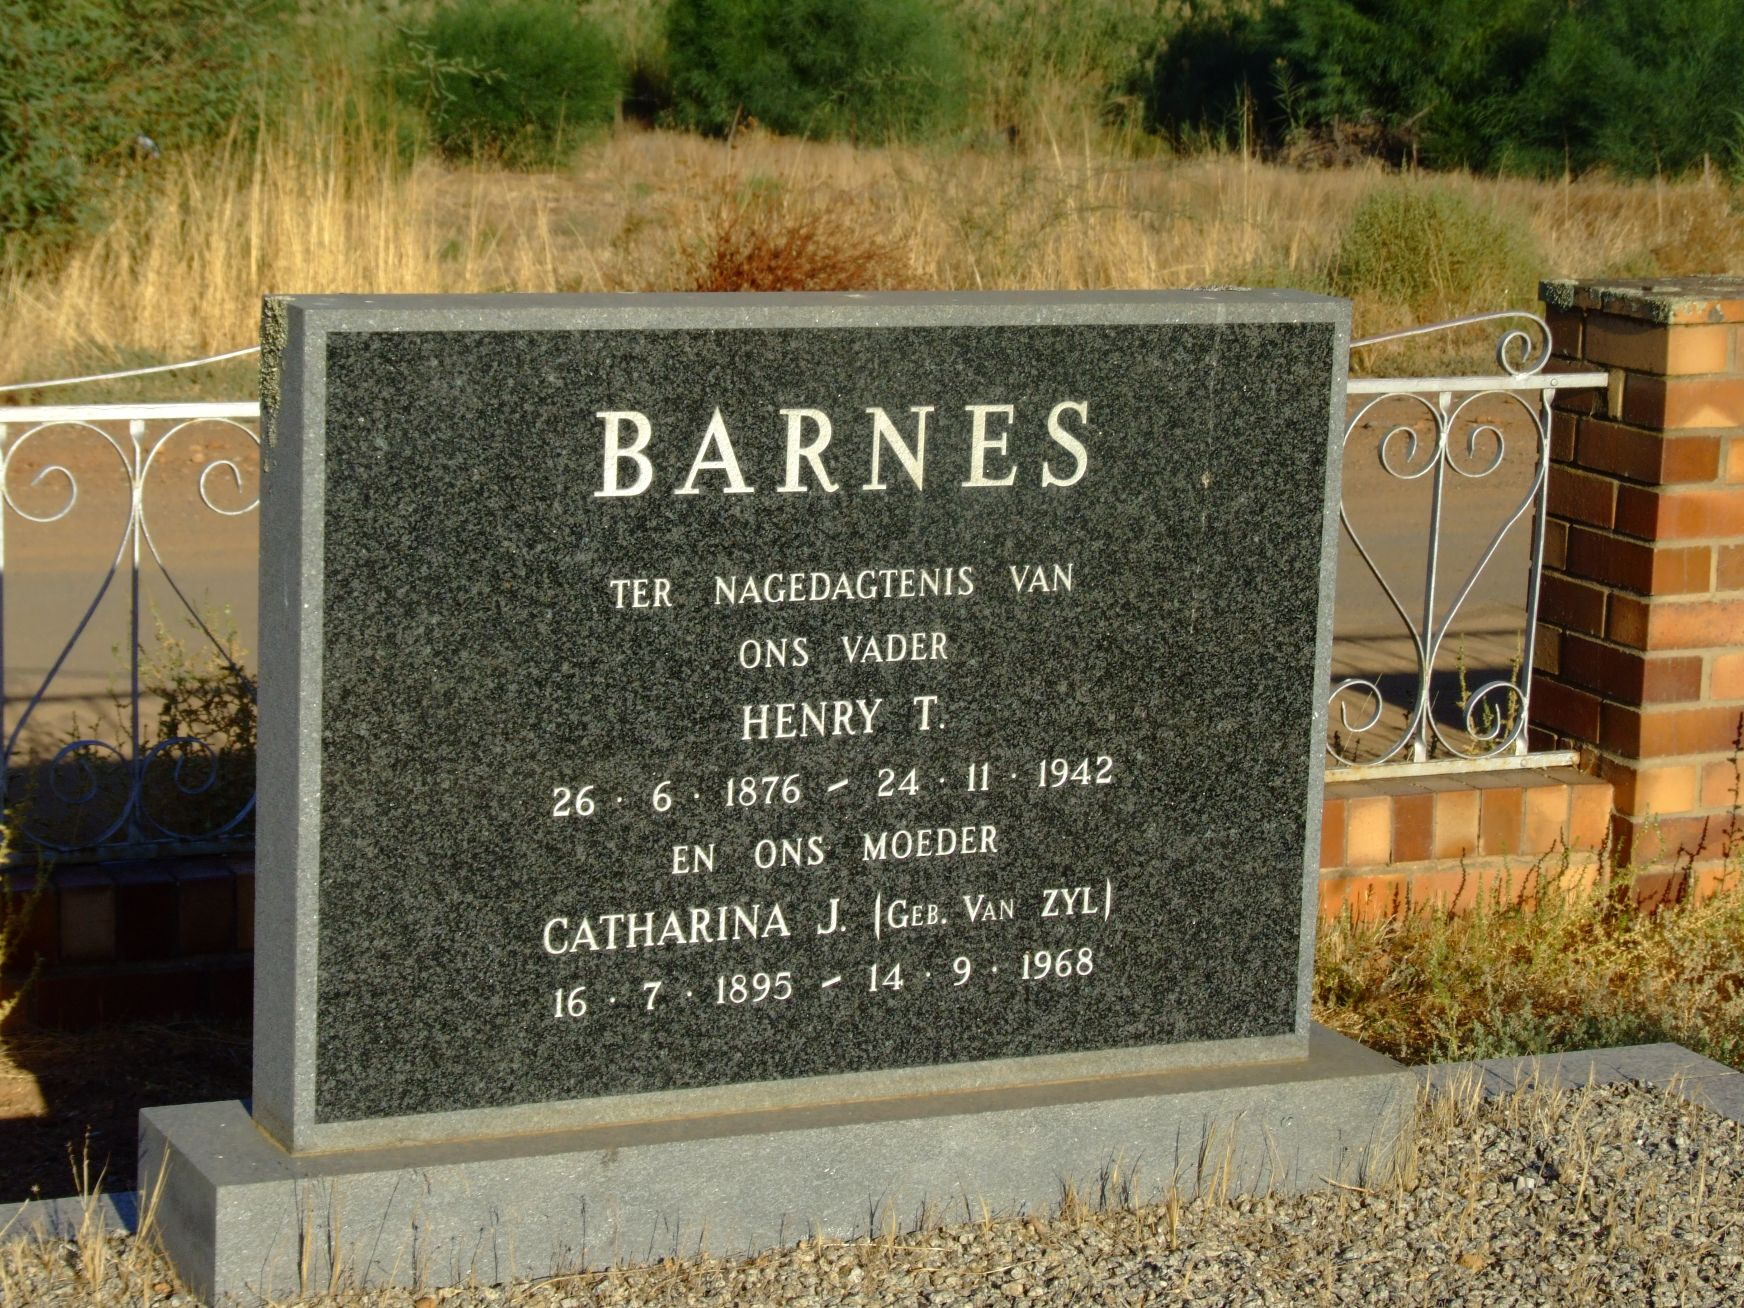 Barnes, Henry T. and Catharina J. nee van Zyl